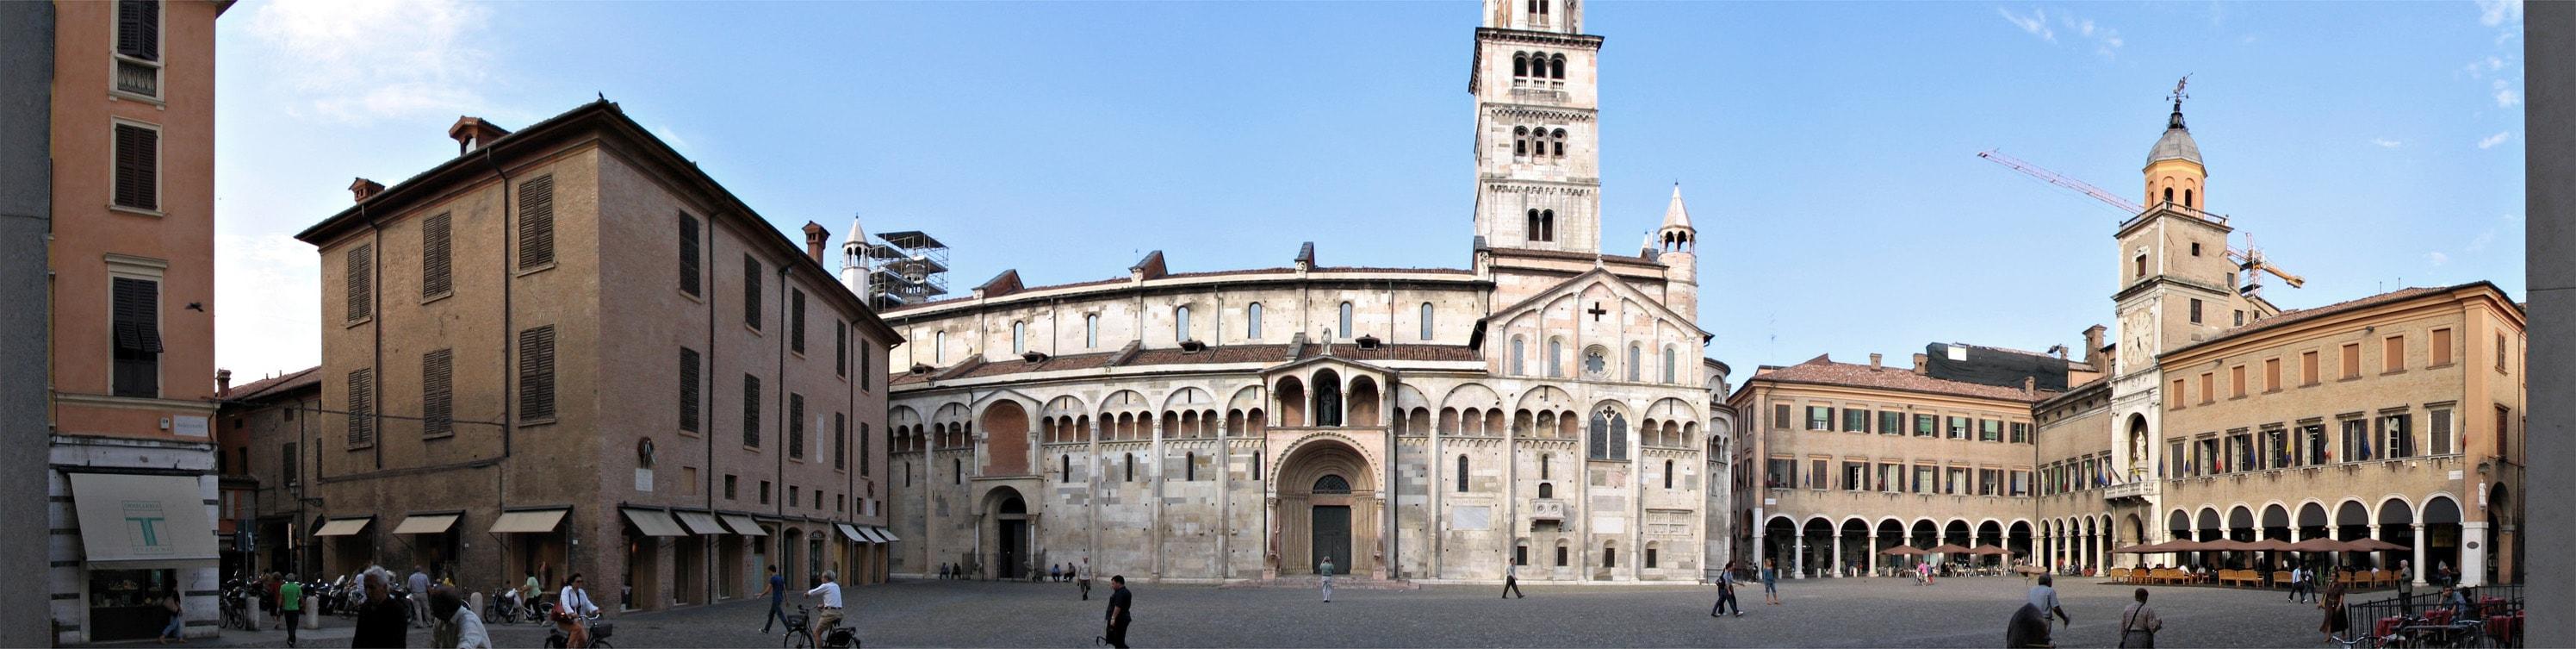 Acquista pneumatici economici a Modena online